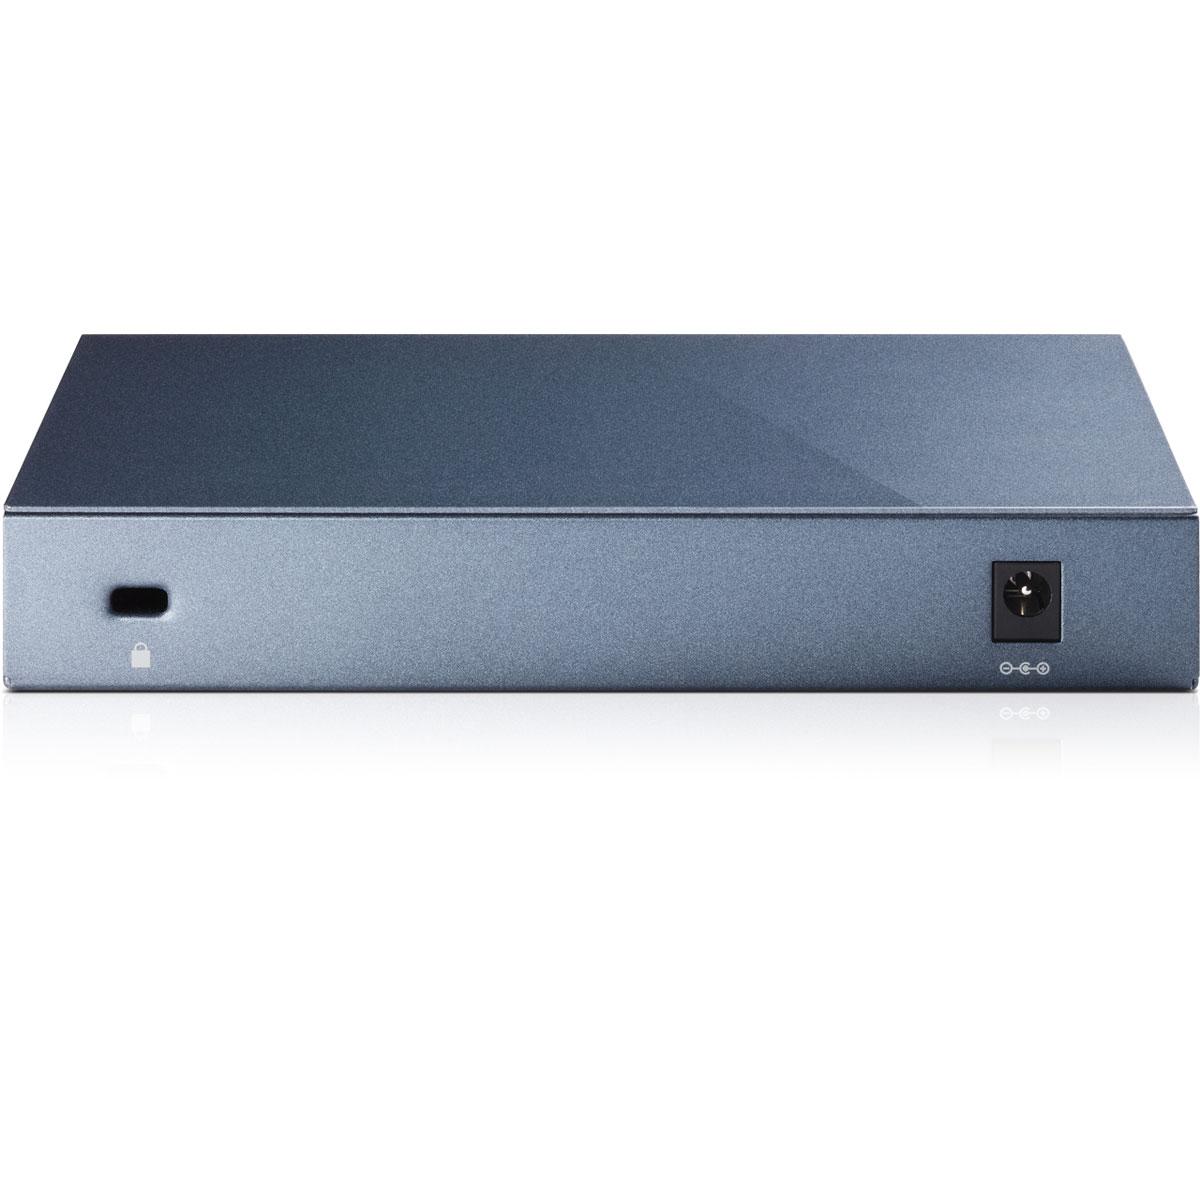 Switch TP-Link 8 ports 10/100/1000 - TL-SG108 - Cybertek.fr - 3